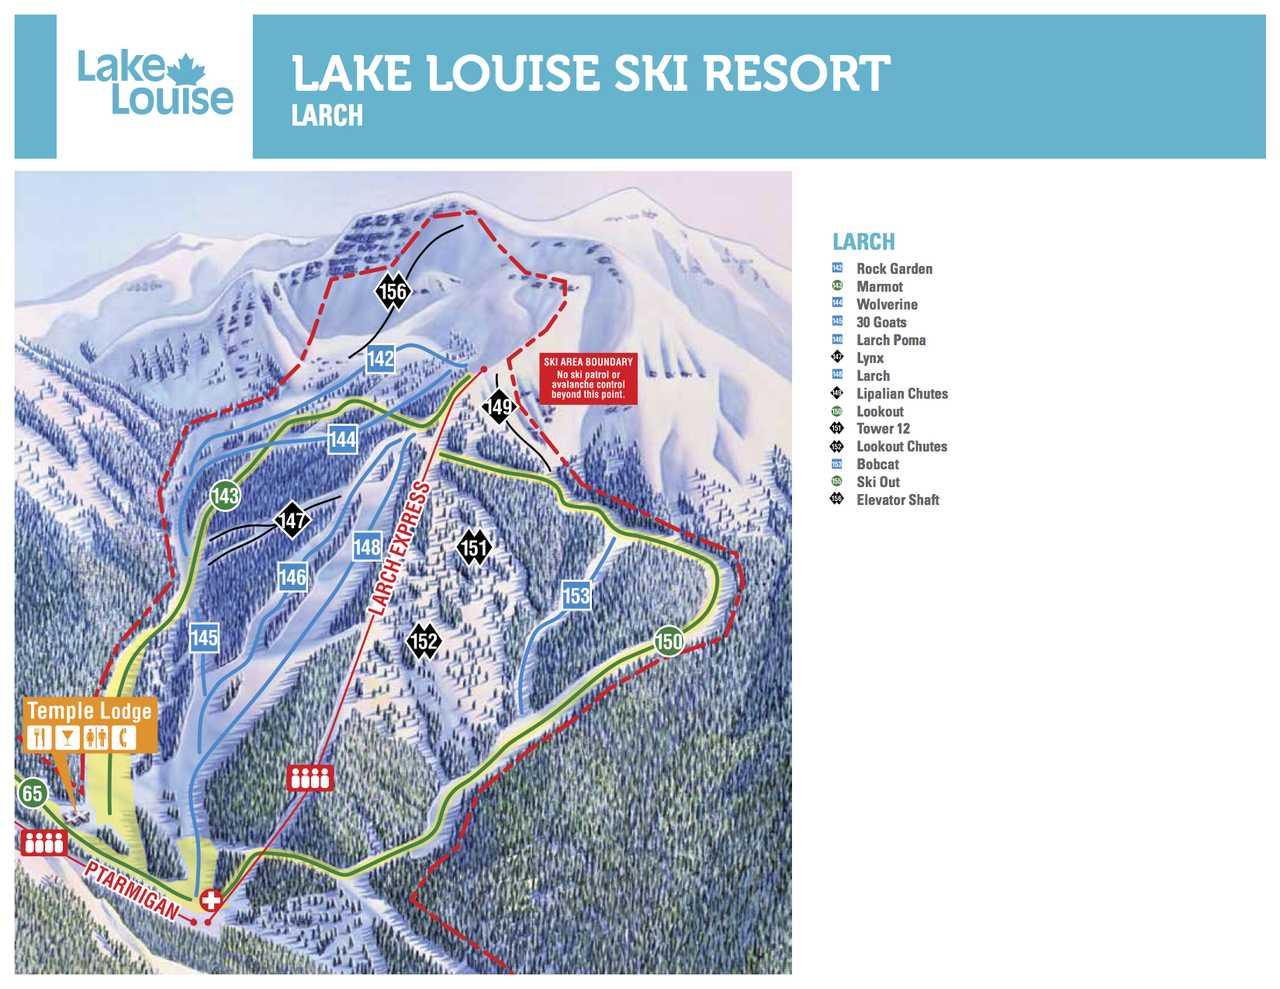 Lake Louise: Das Skigebiet voller Reize | CANUSA